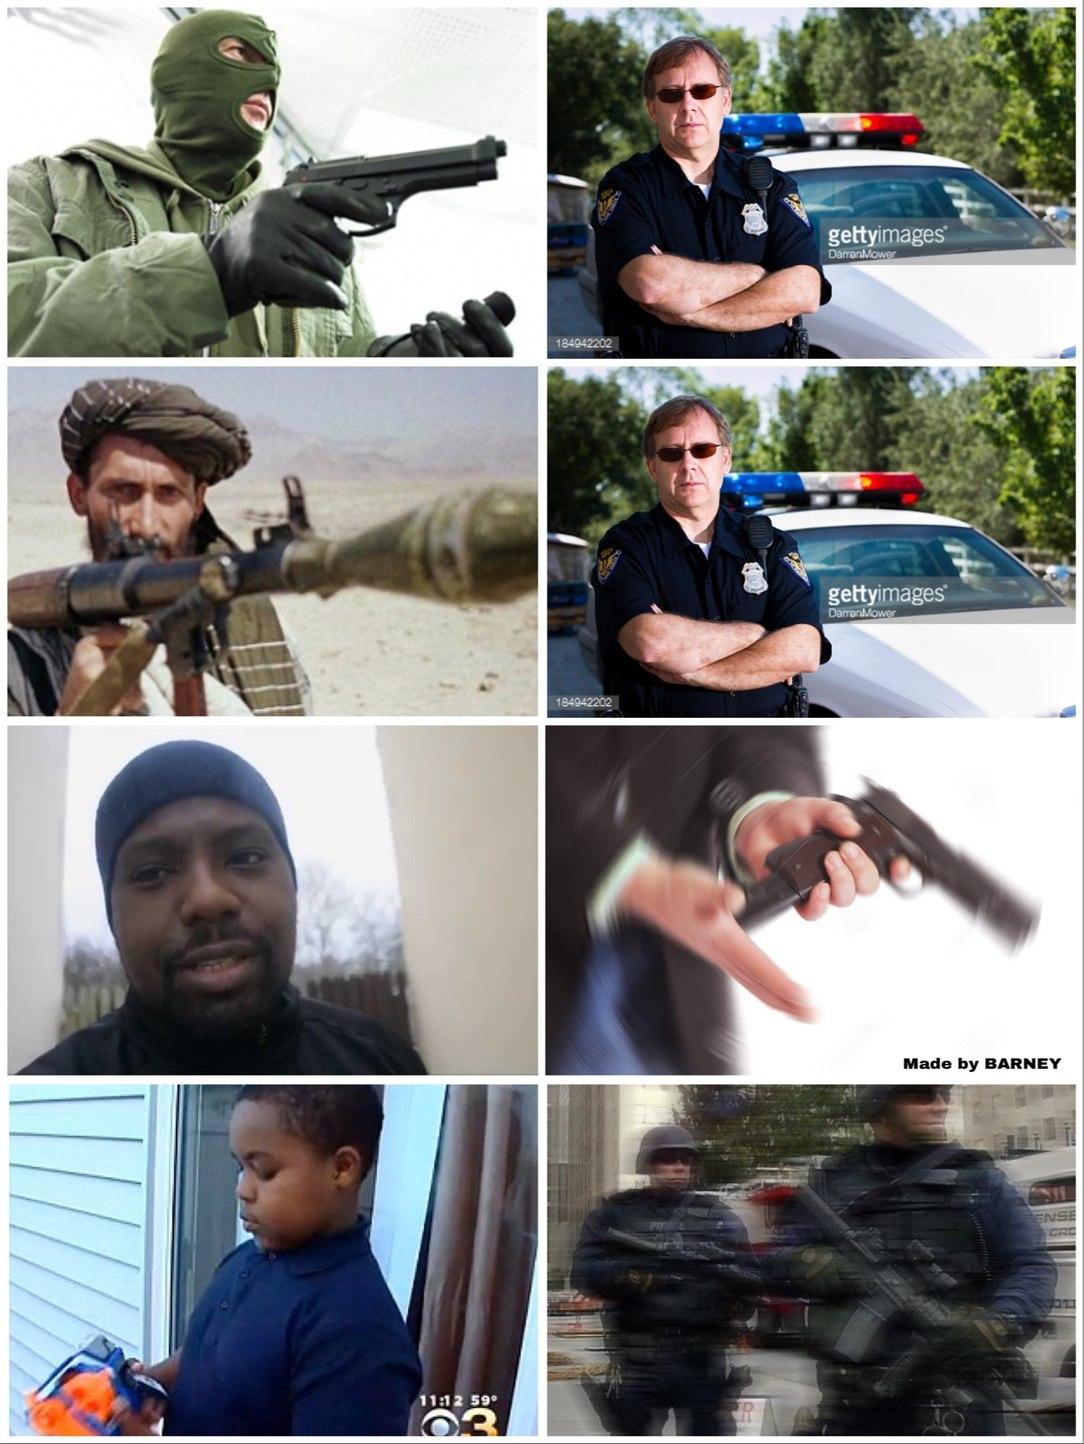 american police 2 - meme